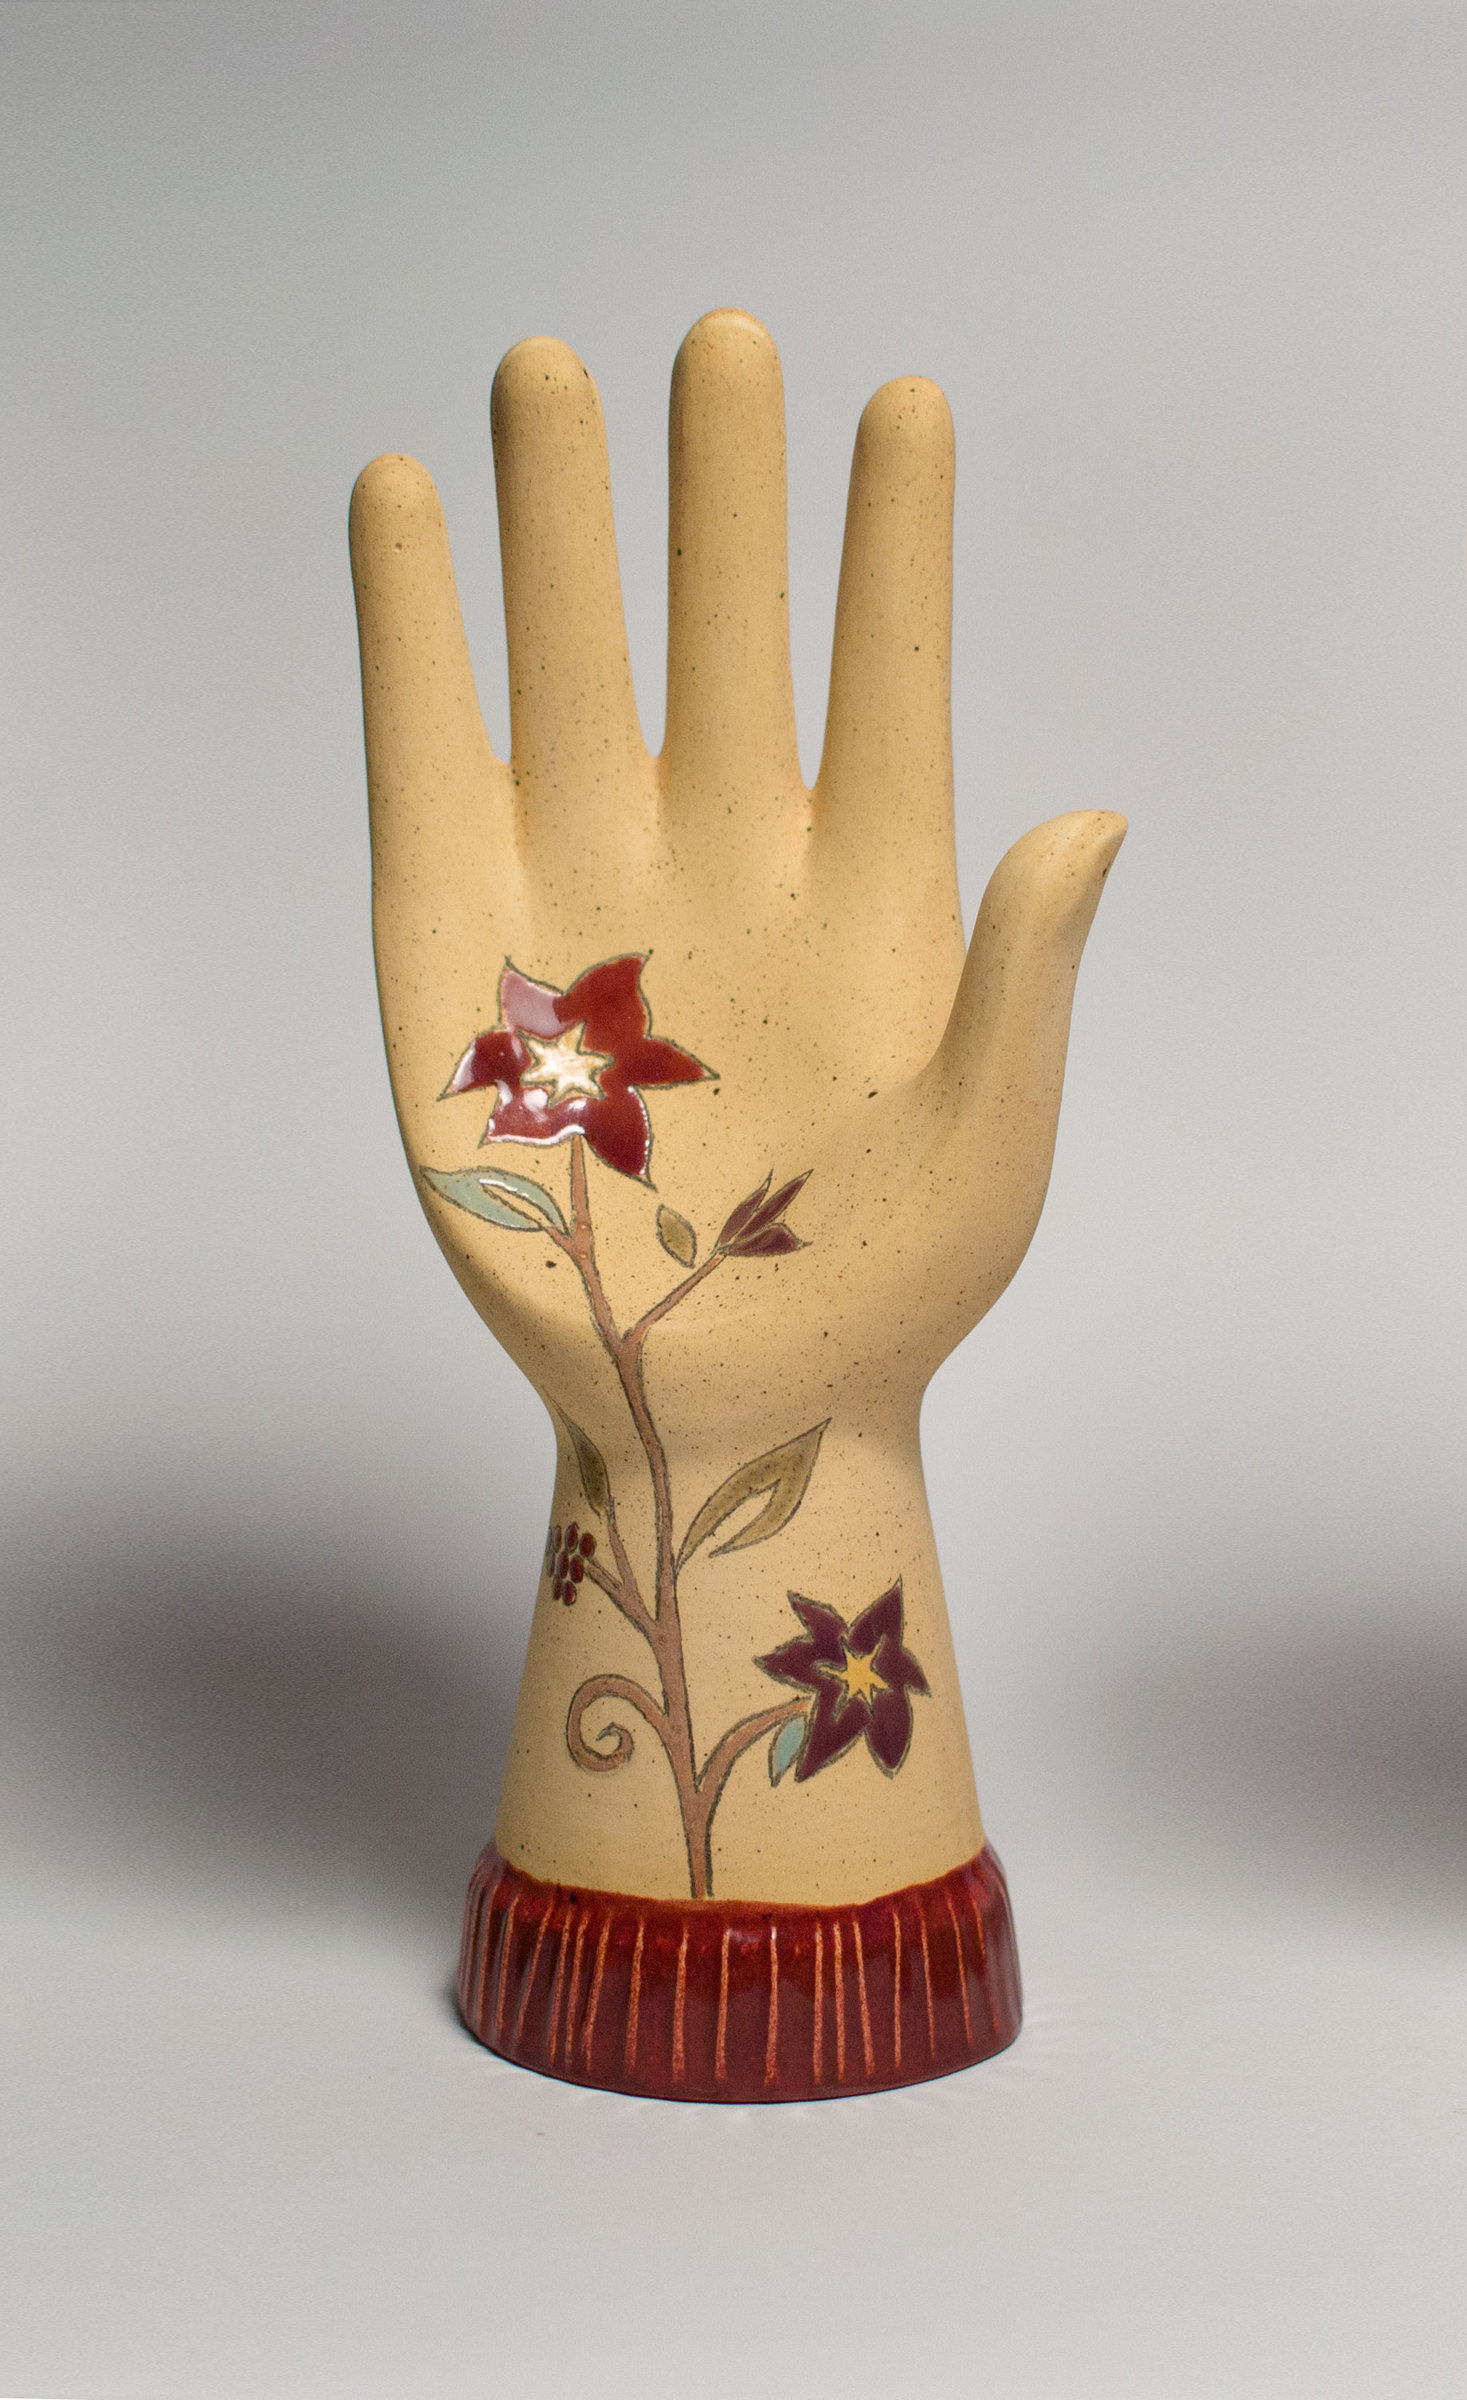 Ceramic Hand Sculpture Eden By Janna Ugone Ceramic Sculpture Artful Home